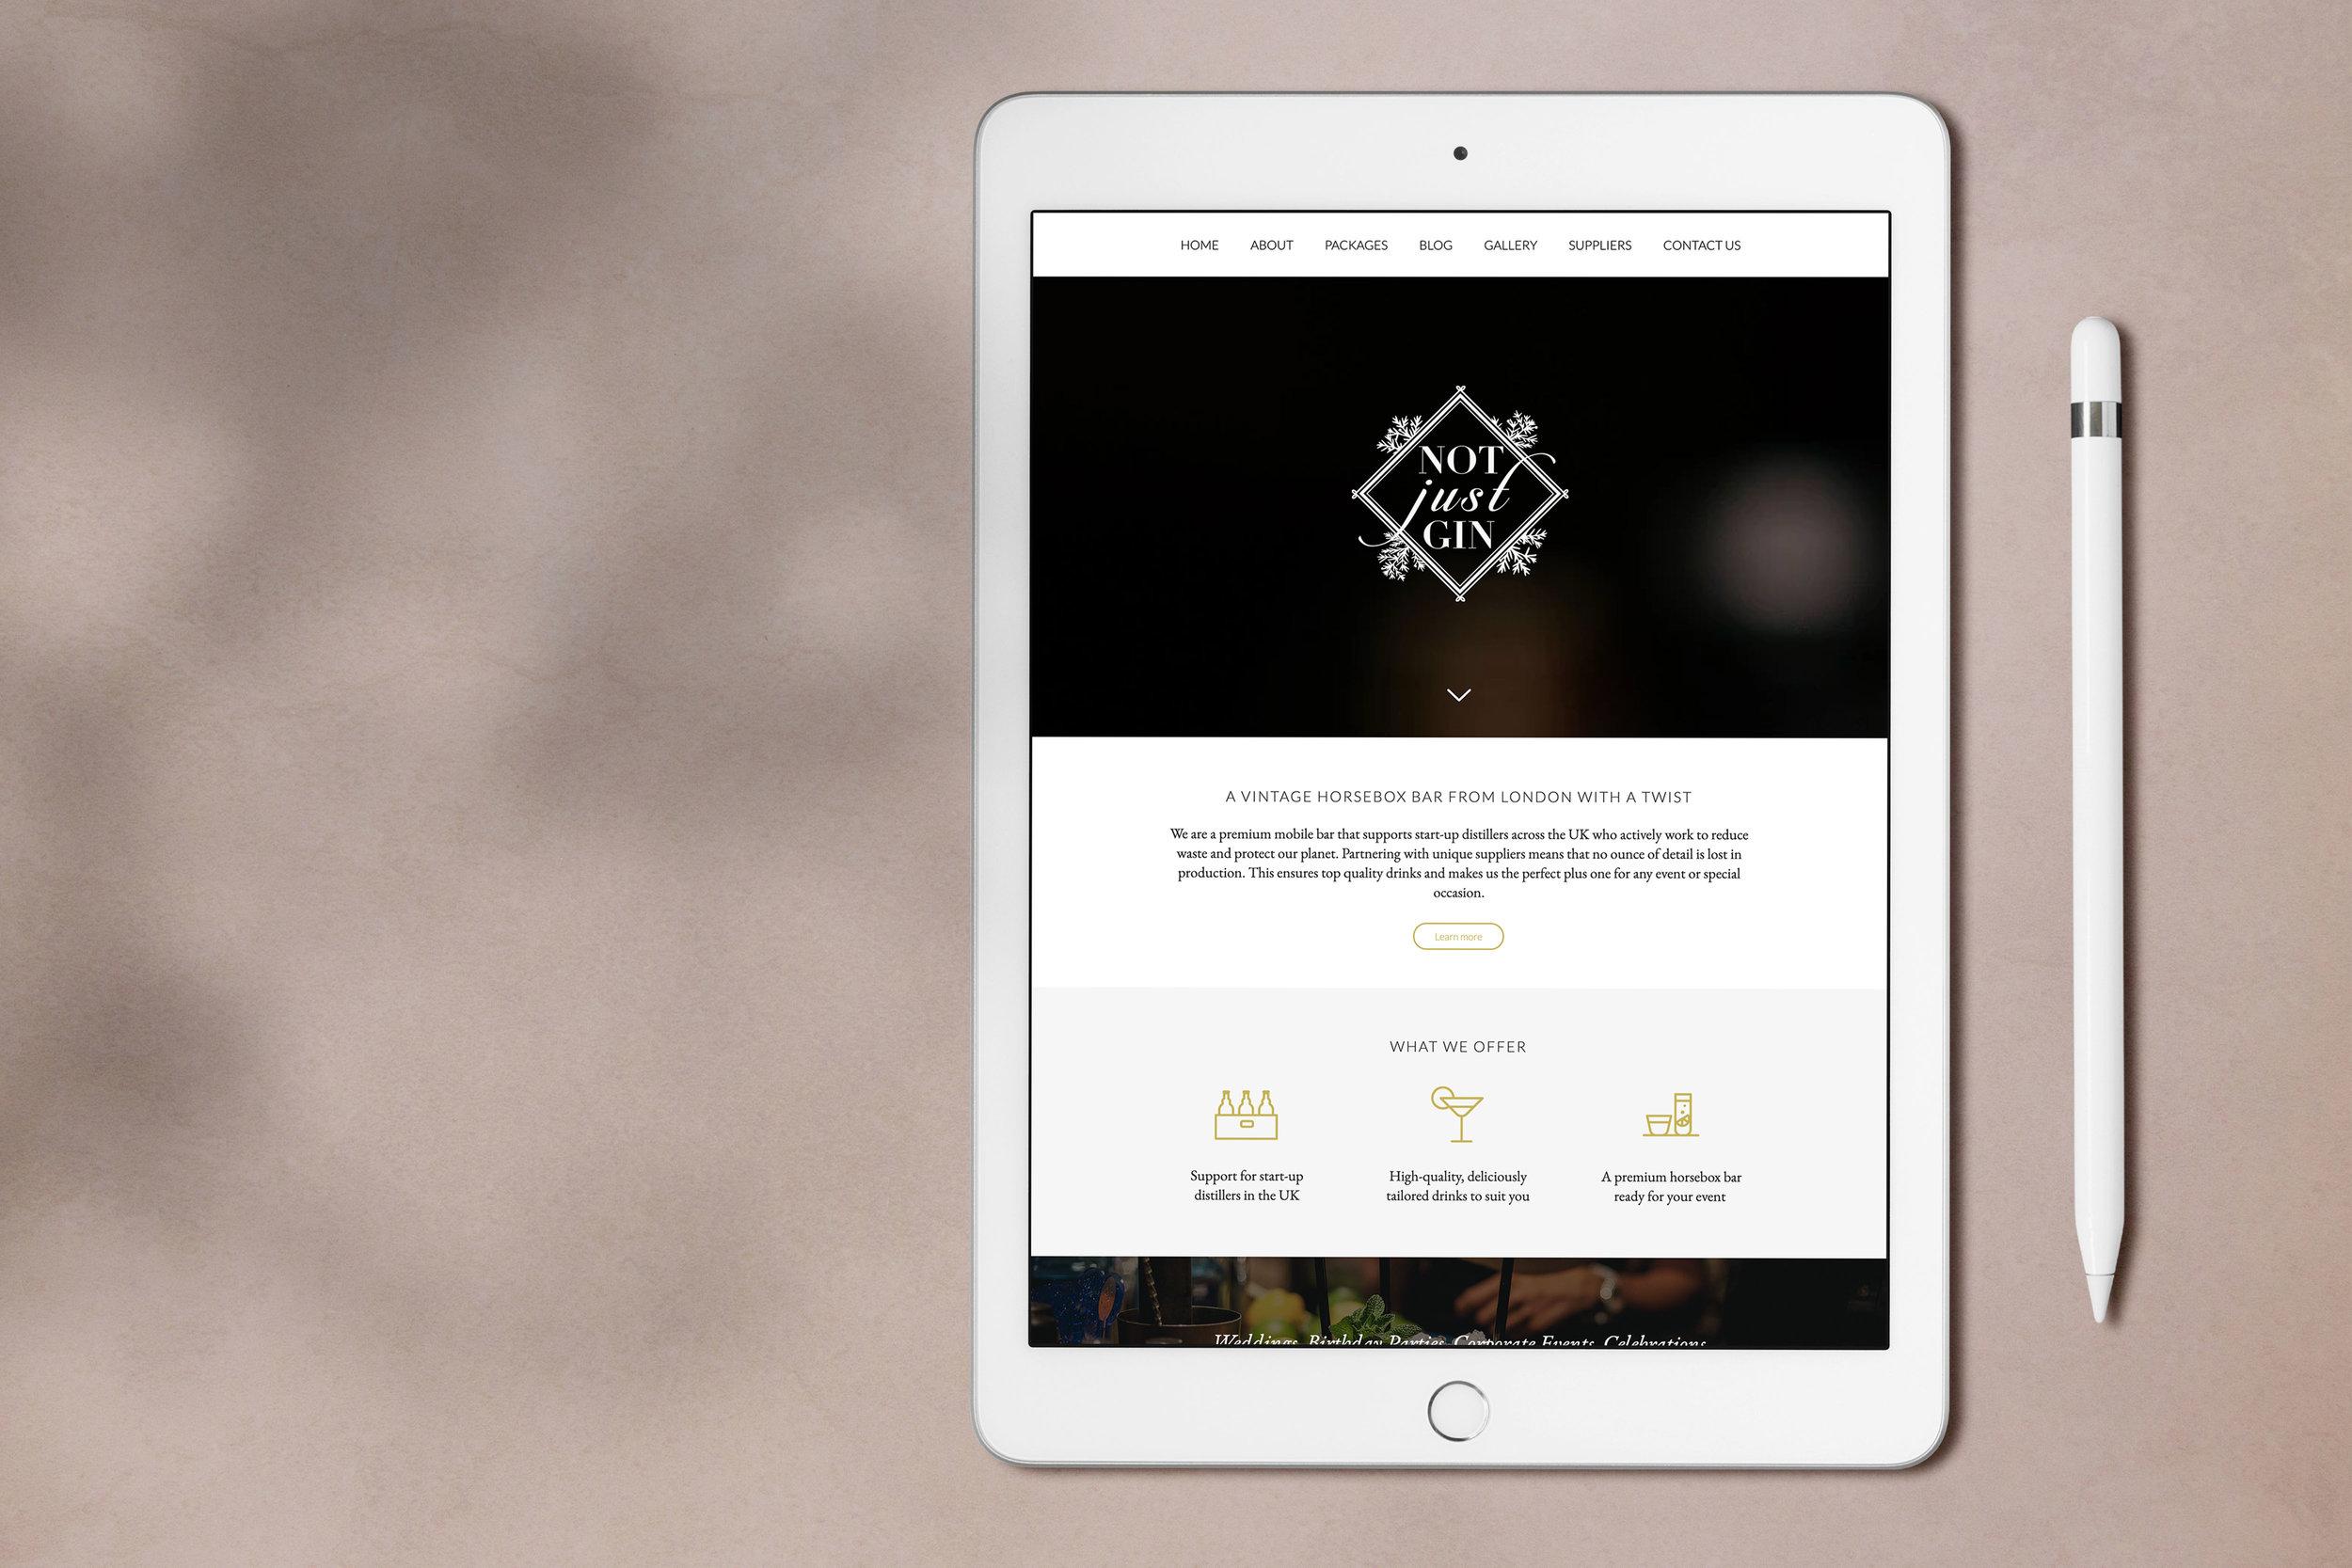 Not-Just-Gin-Website-Branding-Lola-Design-Company-Freelance-Graphic-Designer-London.jpg